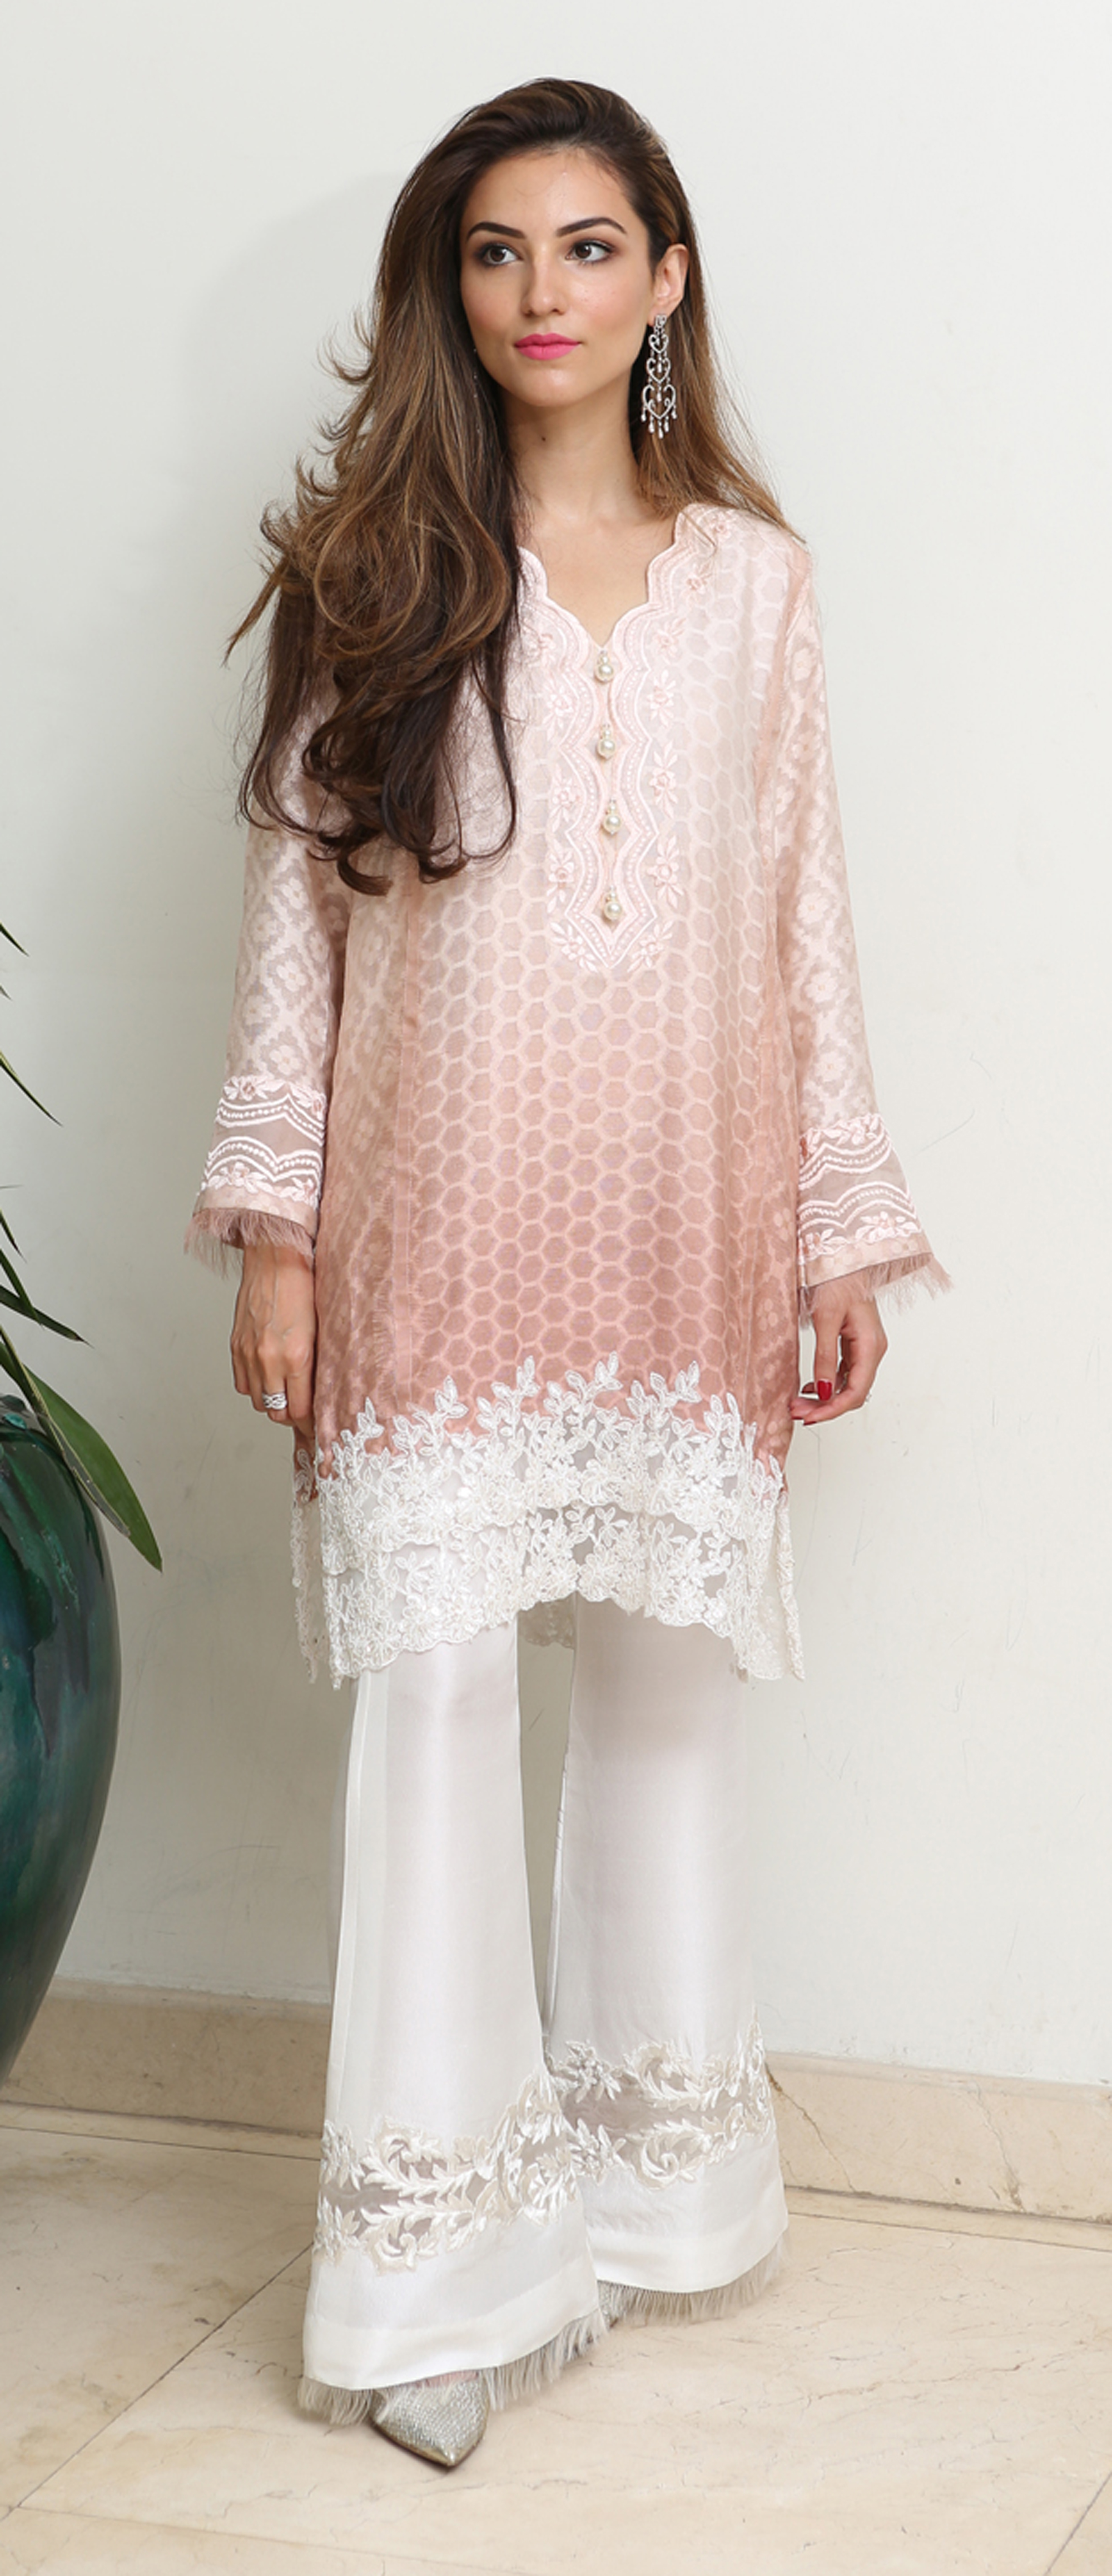 numra-waqas-understated-elegance-in-rema-shehrbano